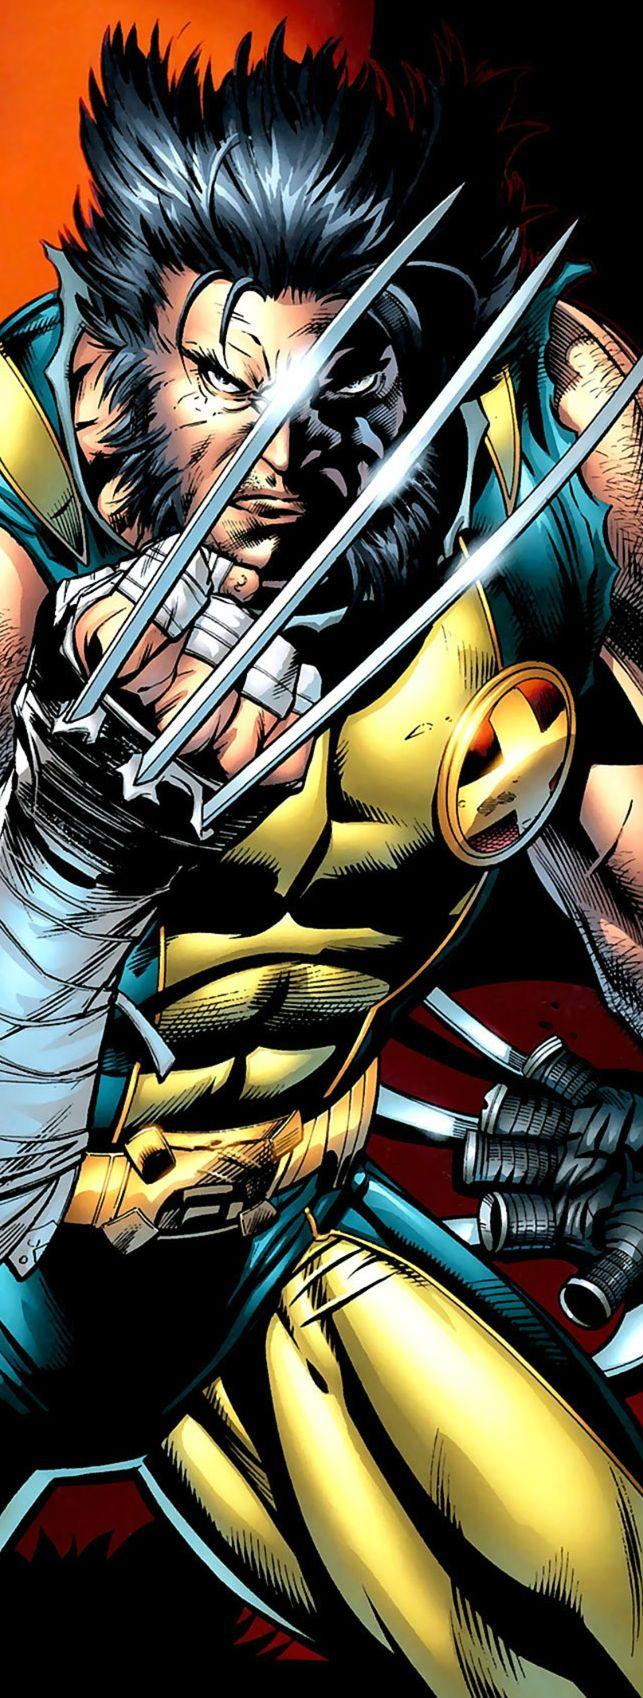 Marvel Comics Wolverine by Scot Eaton. For similar content follow me @jpsunshine10041